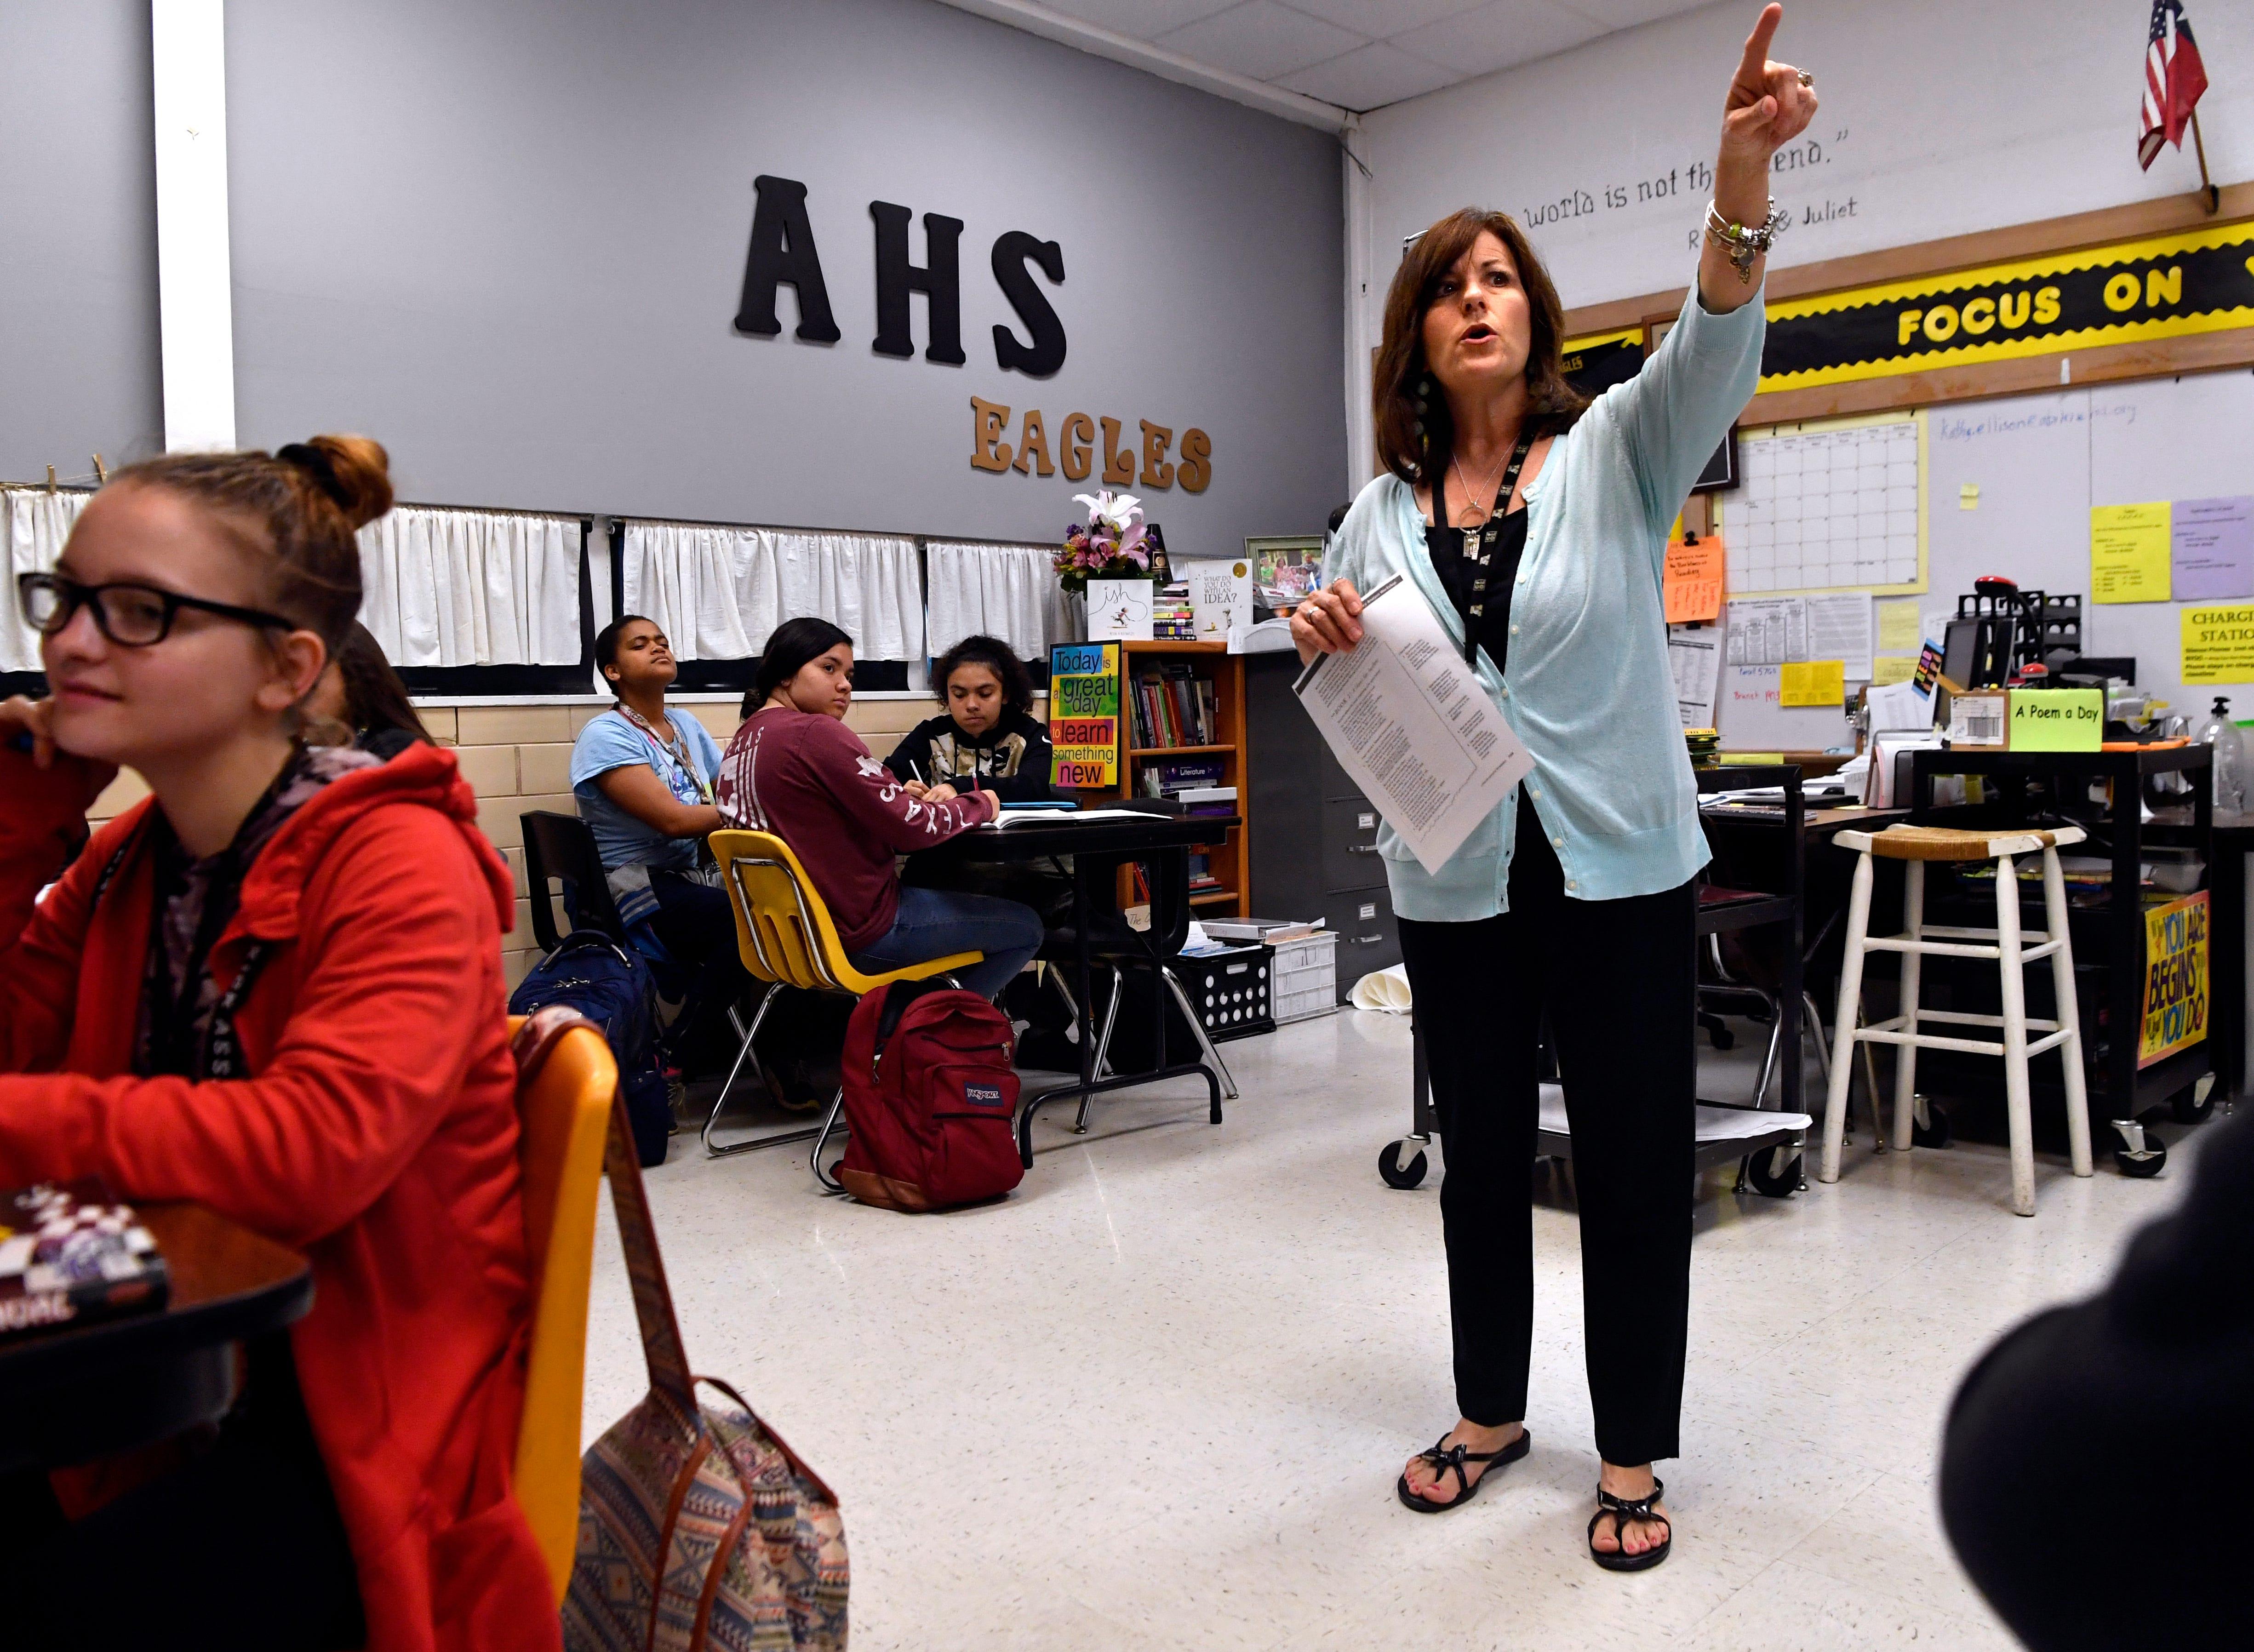 Kathy Ellison teaches an English class at Abilene High School.